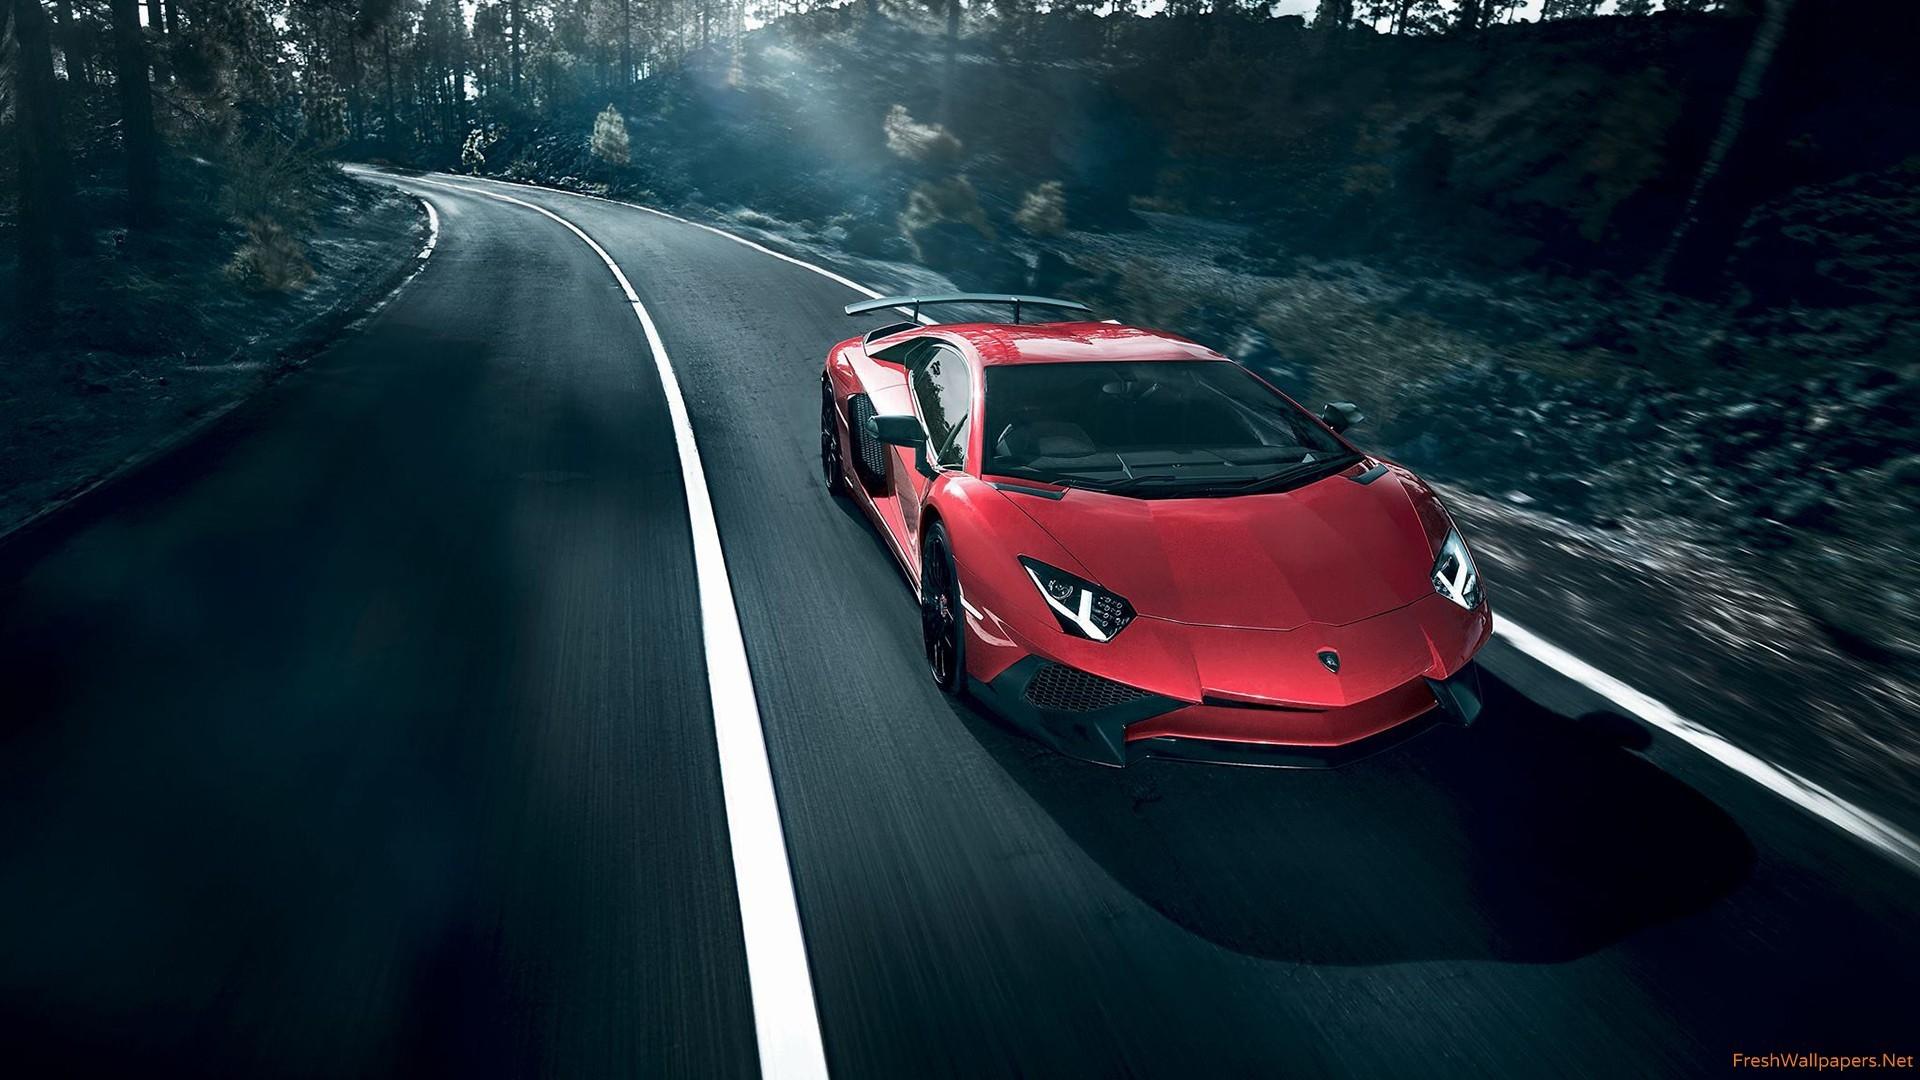 Lamborghini Wallpaper 1080p (74+ pictures)